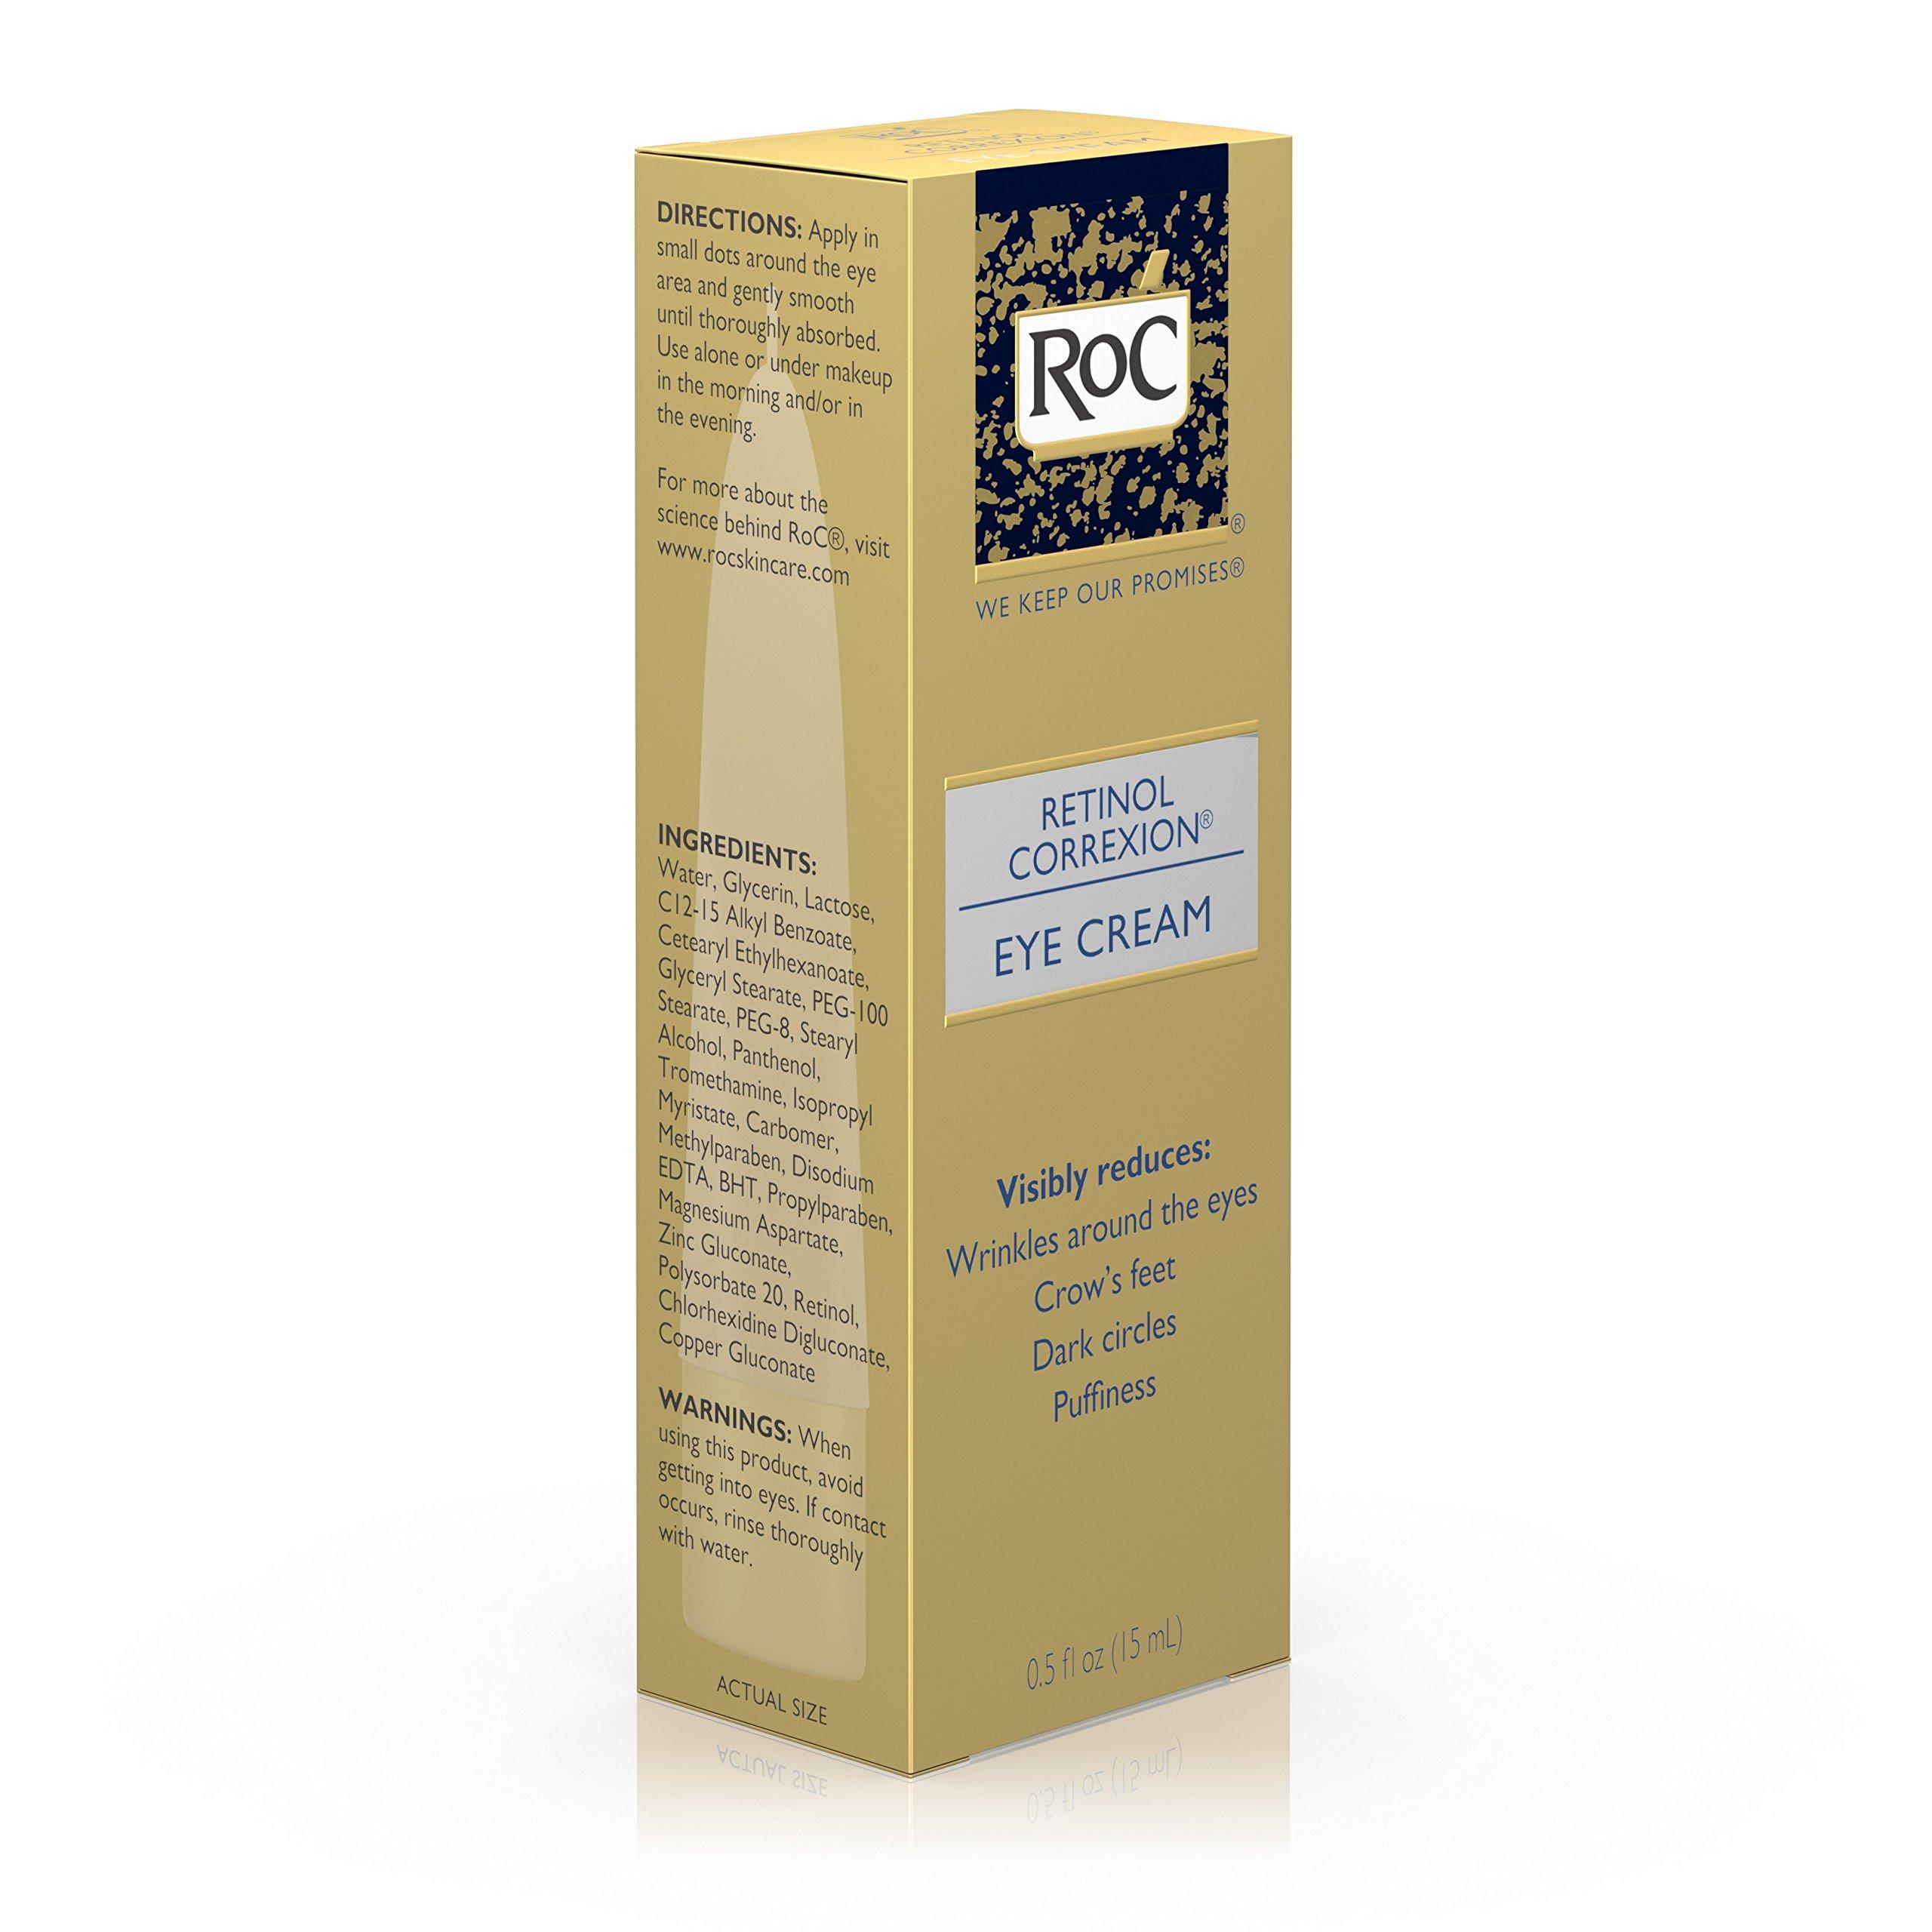 Roc Retinol Correxion Anti-Aging Eye Cream Treatment for